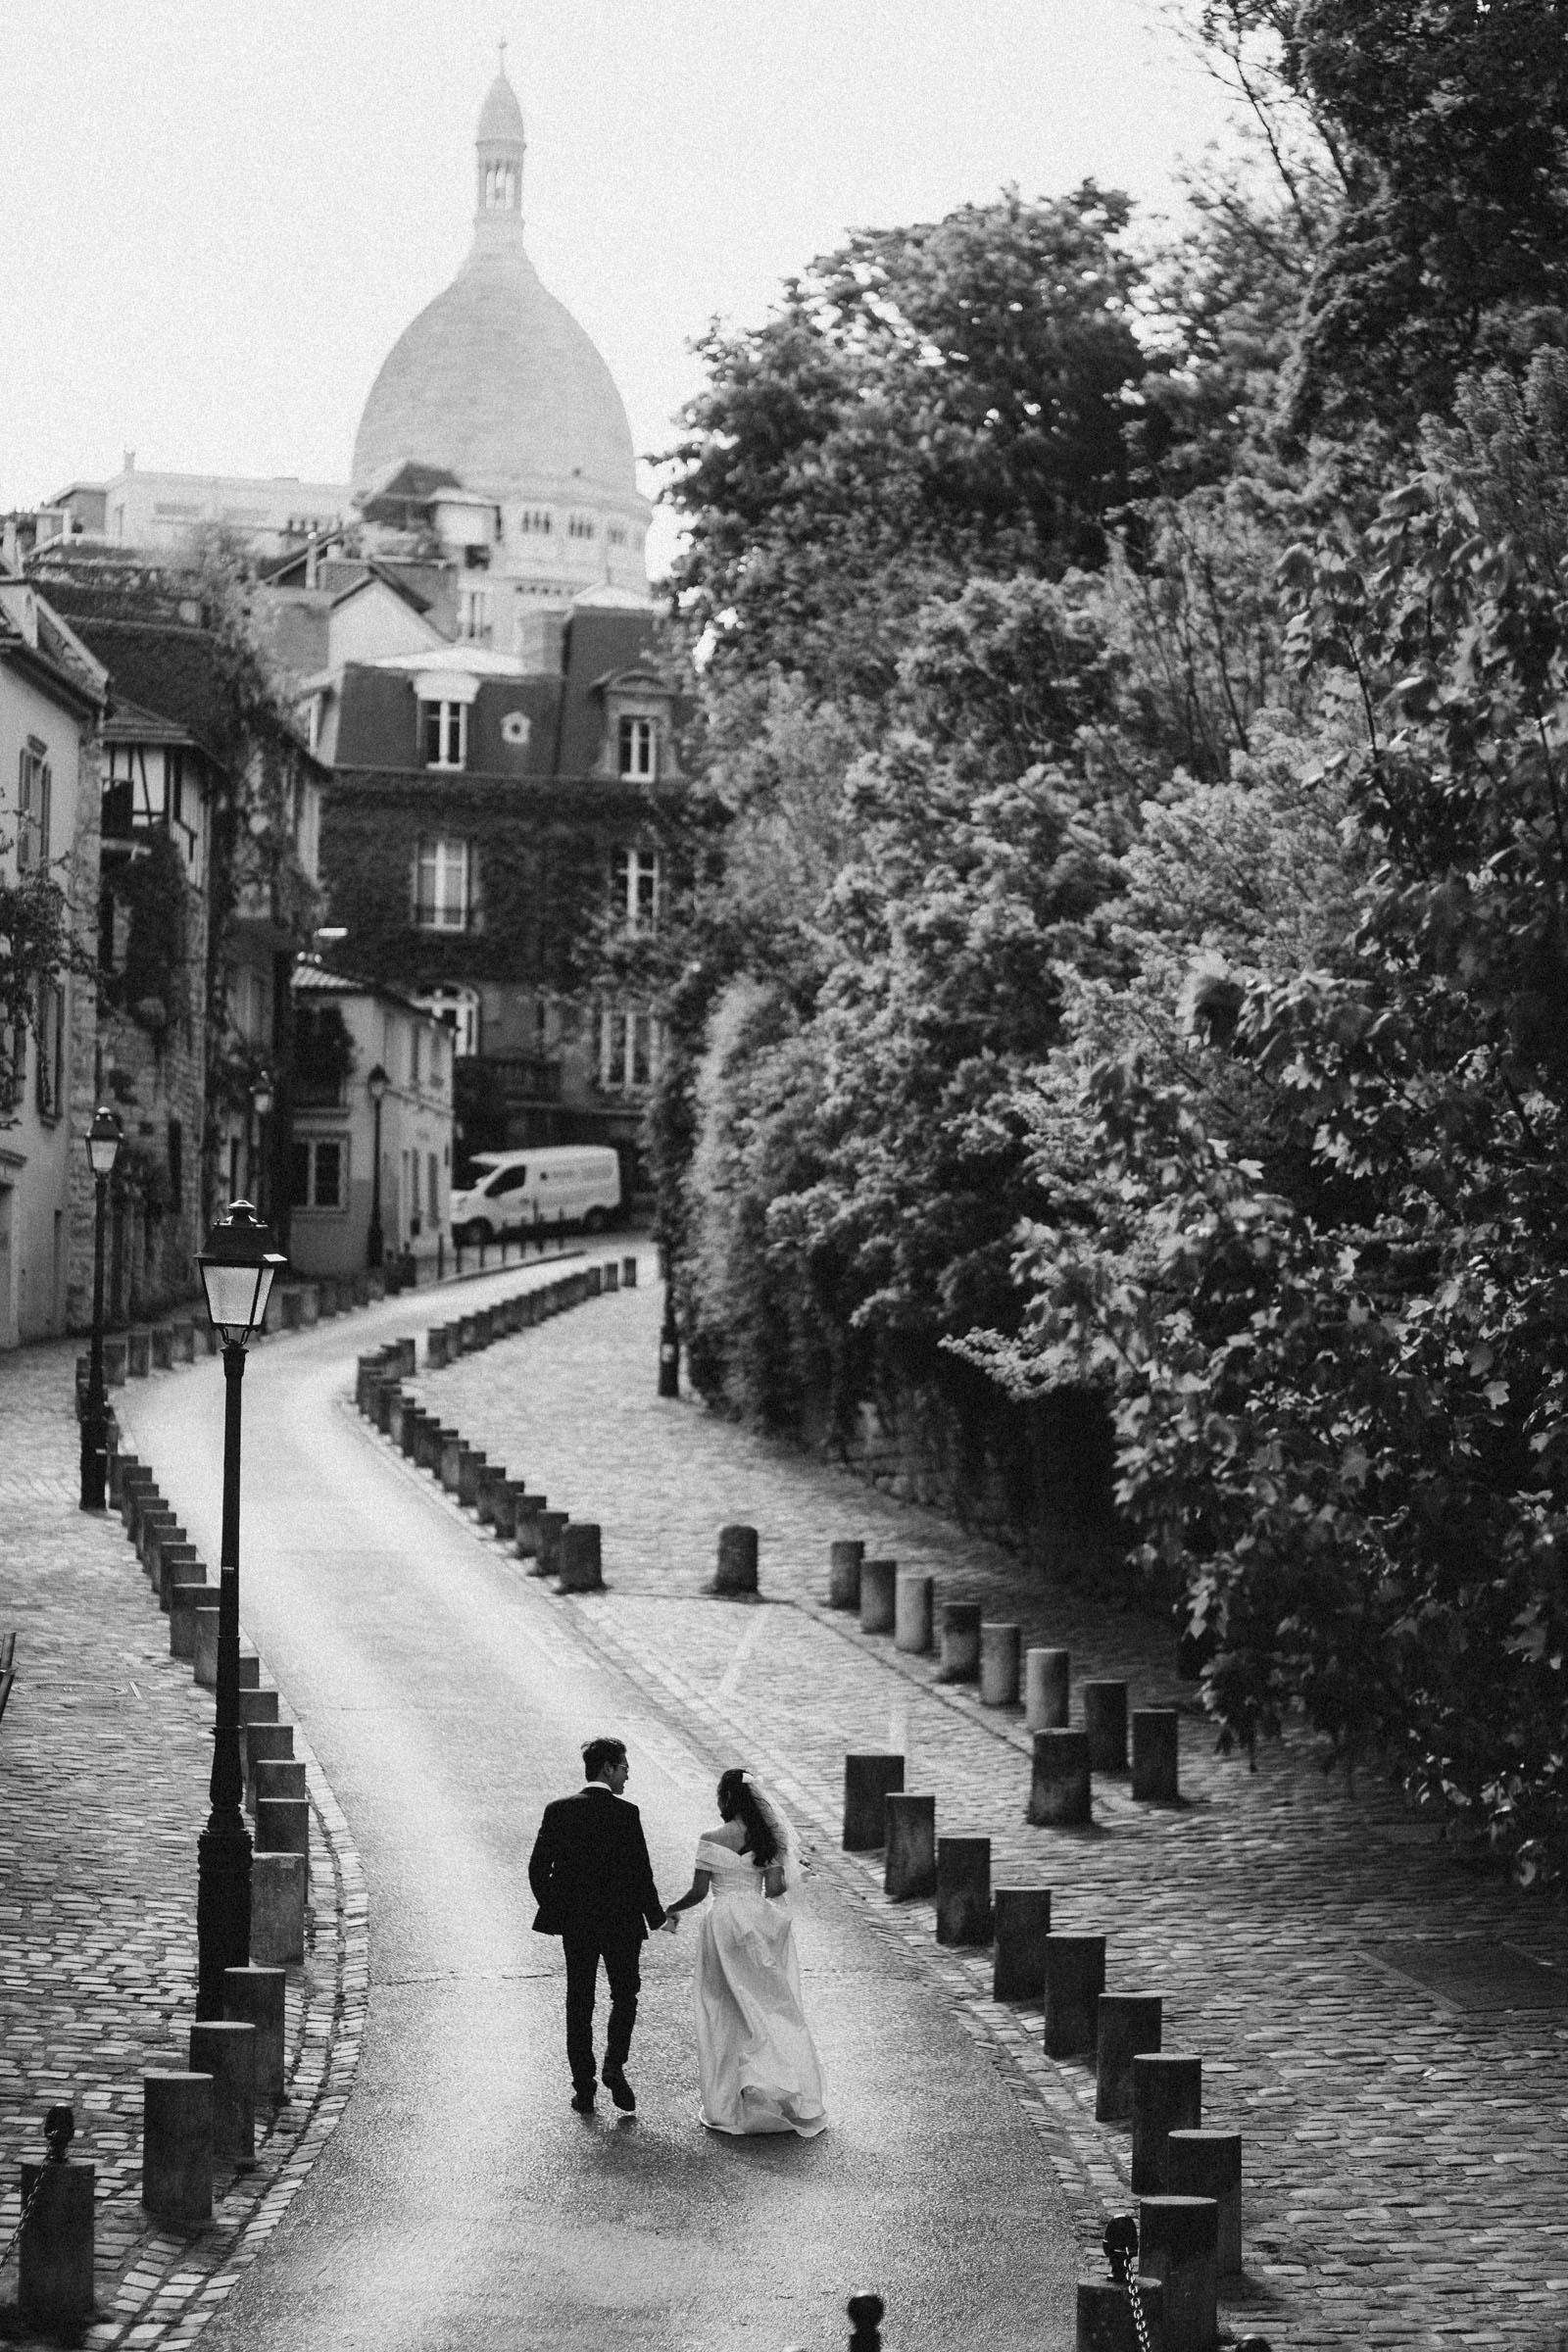 pre-wedding-photos-montmartre-paris-black-and-white